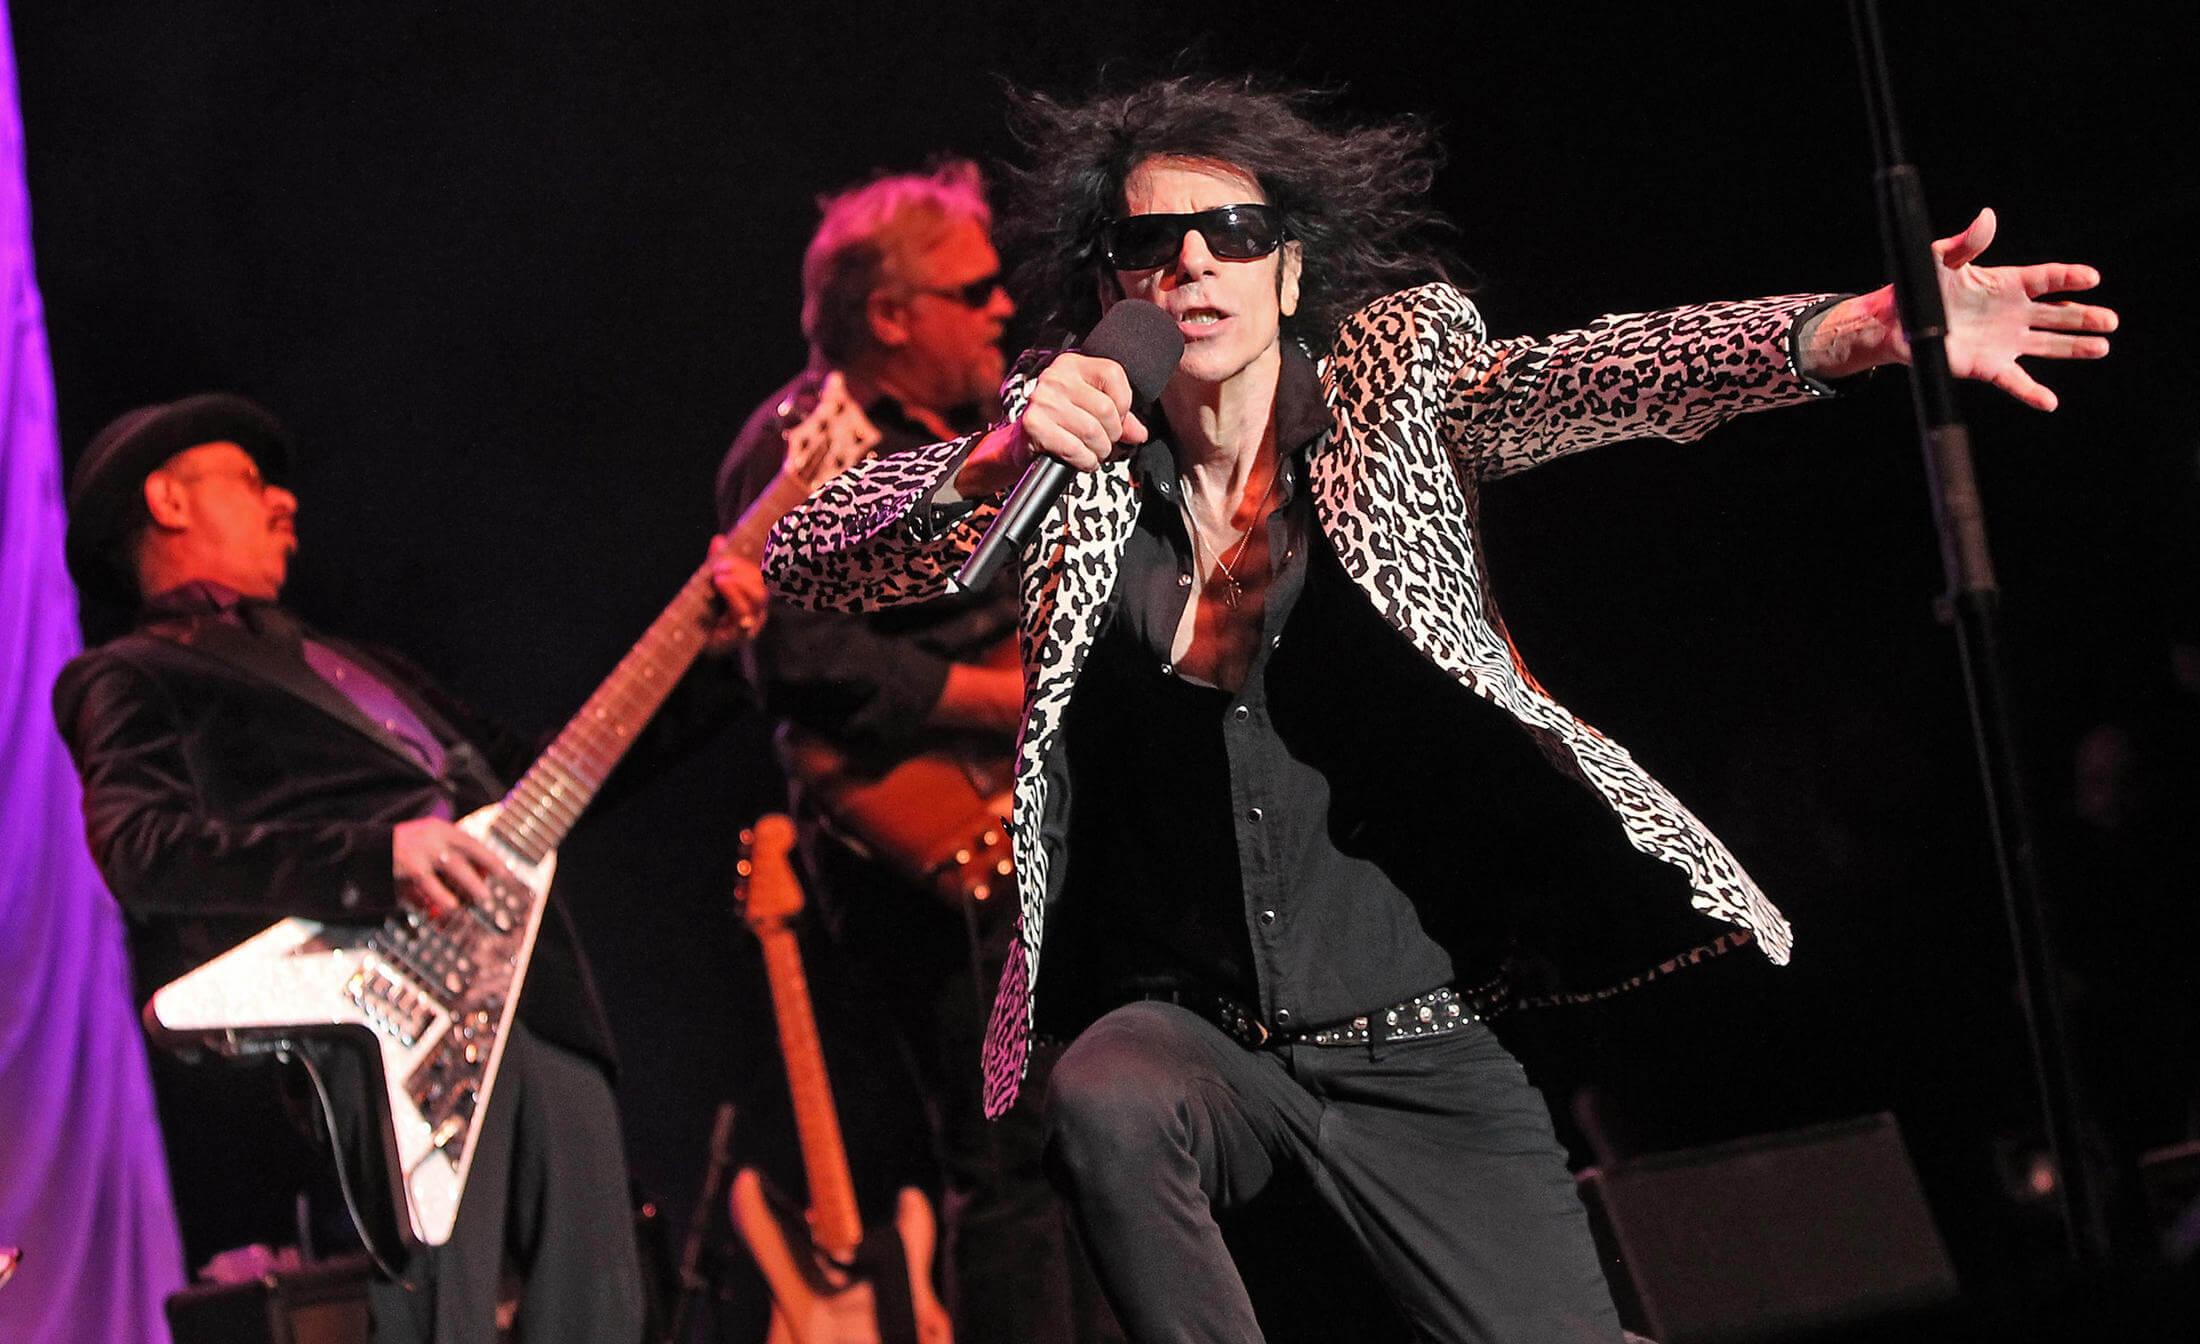 J. Geils Band | Guitarist Pronounced Dead at 71 | Celebrity Death | Music News 2017